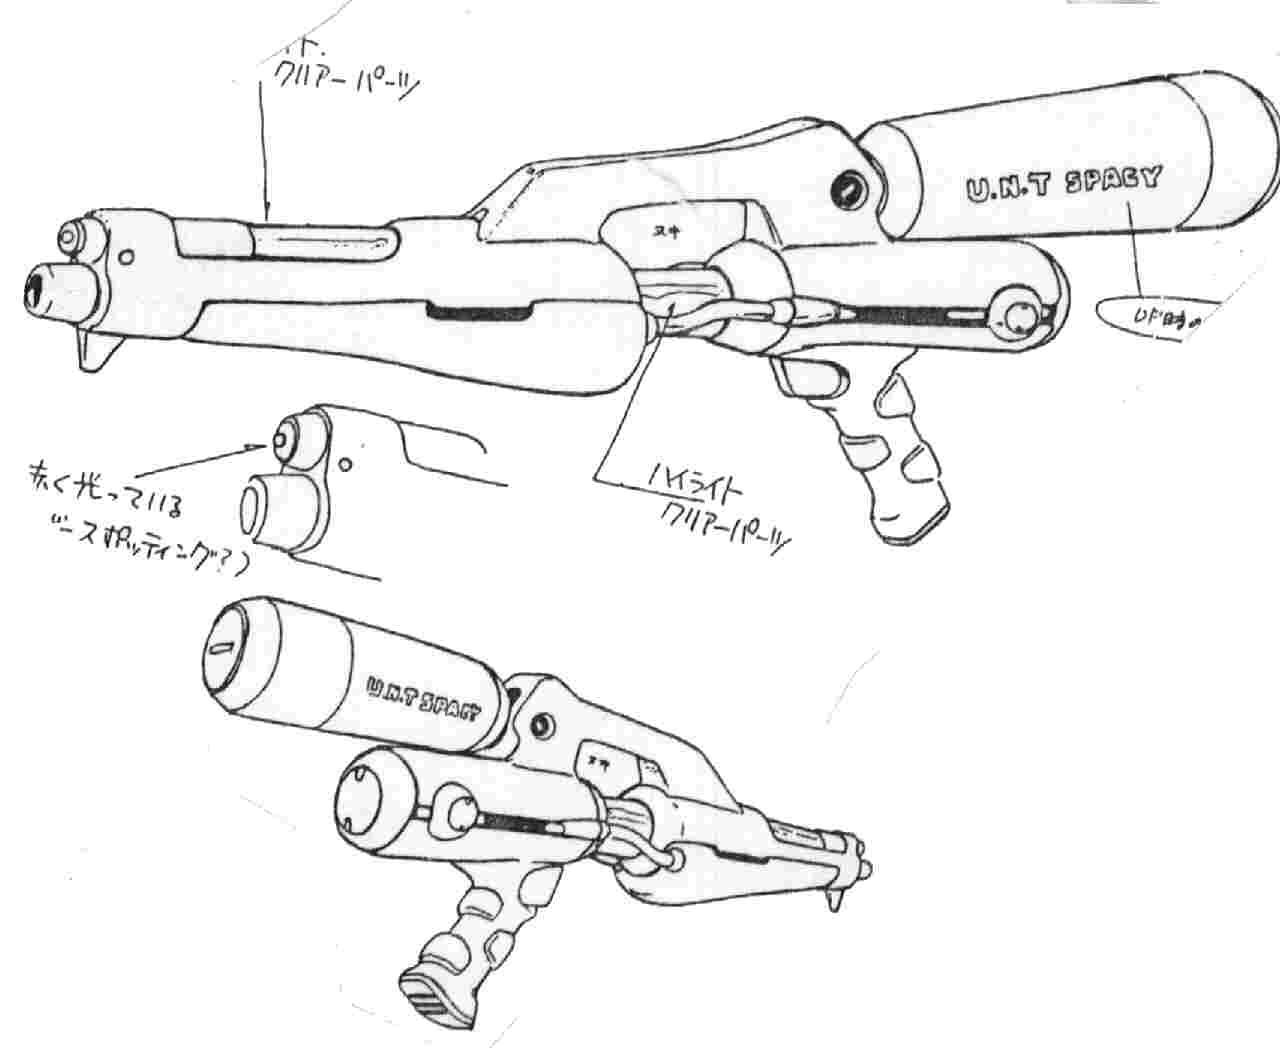 Heavyweapons